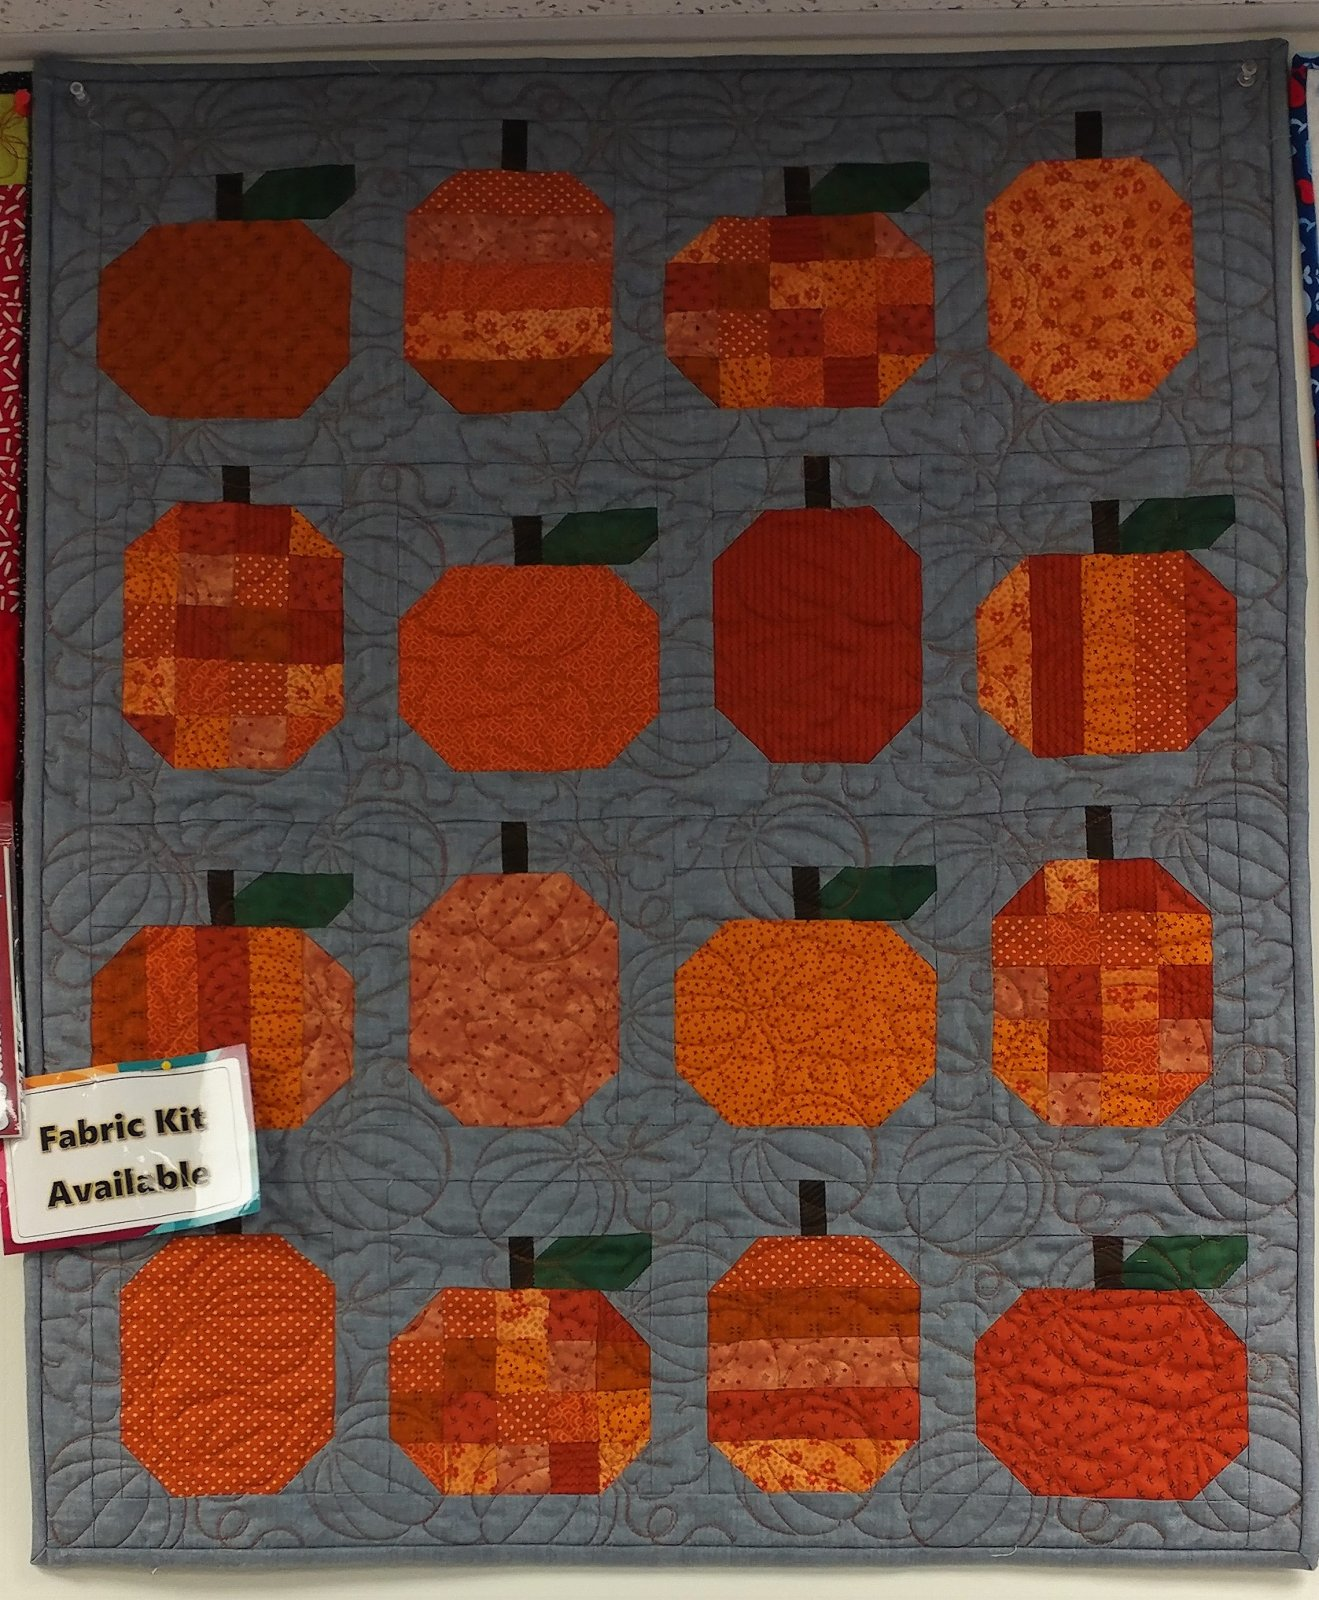 Mini Pumpkins, Fabric Kit, Pattern by Cluck Cluck Sew : CCS-174